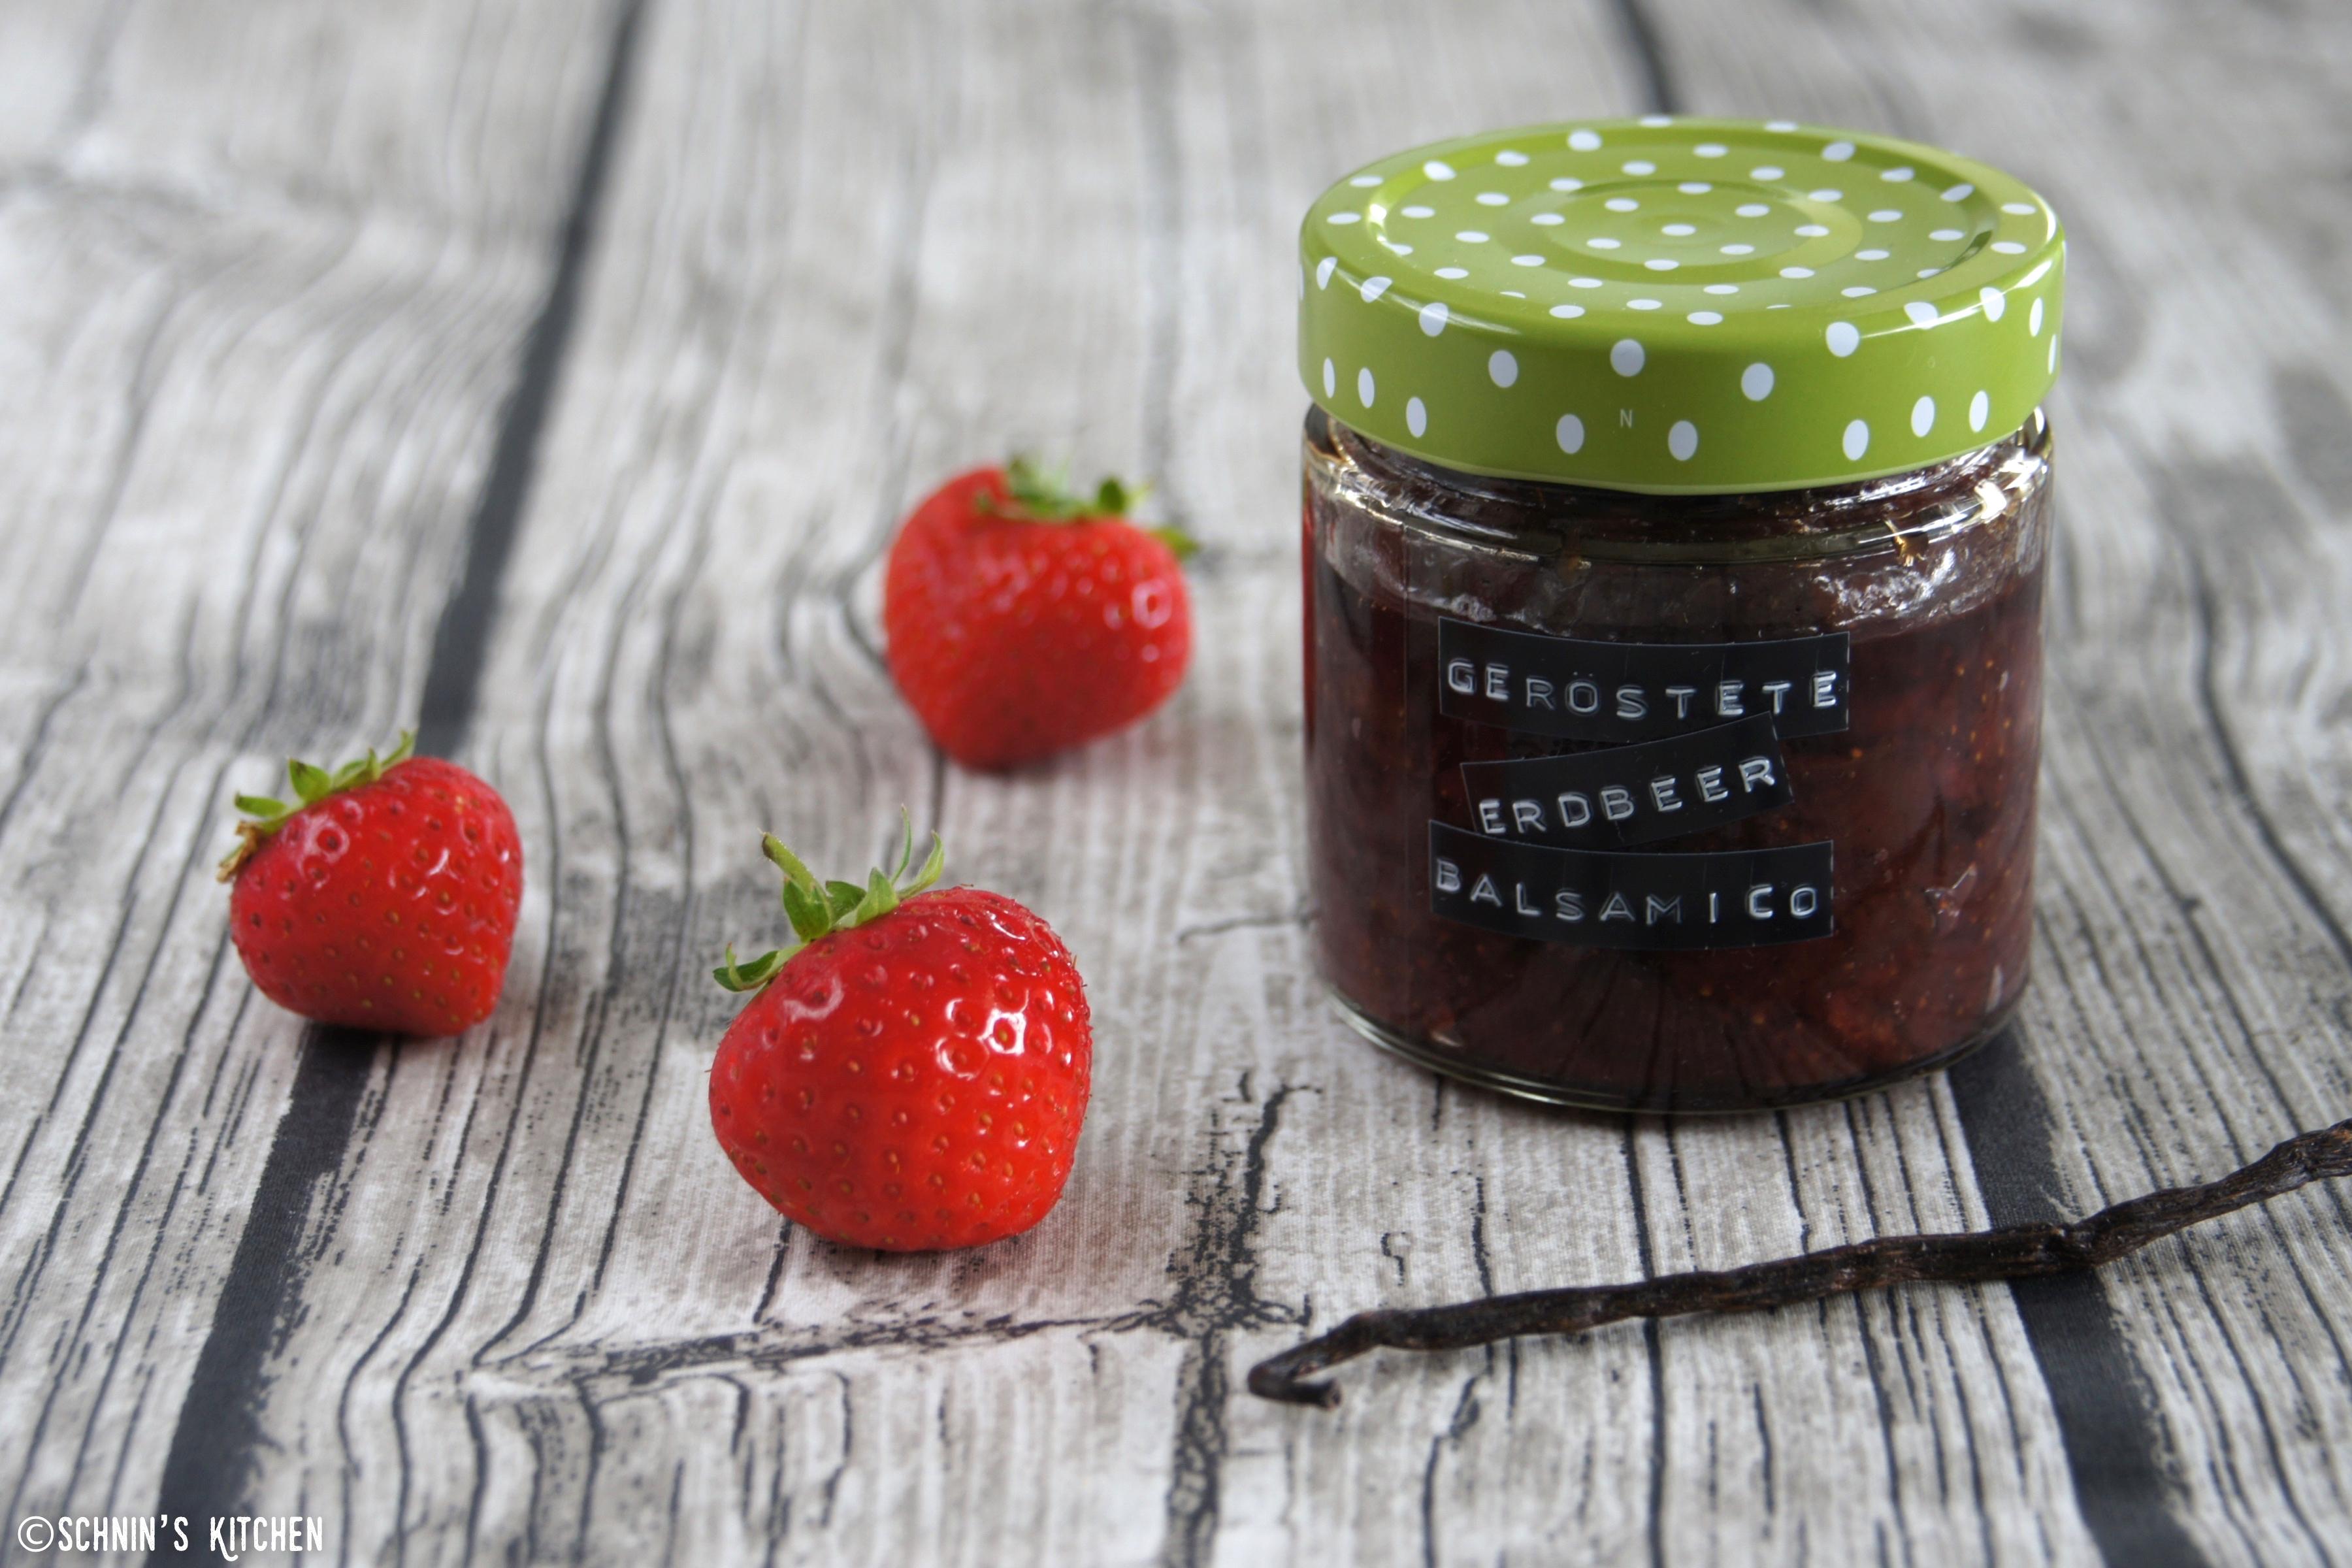 Schnin's Kitchen: Geröstete Erdbeer-Balsamico-Marmelade